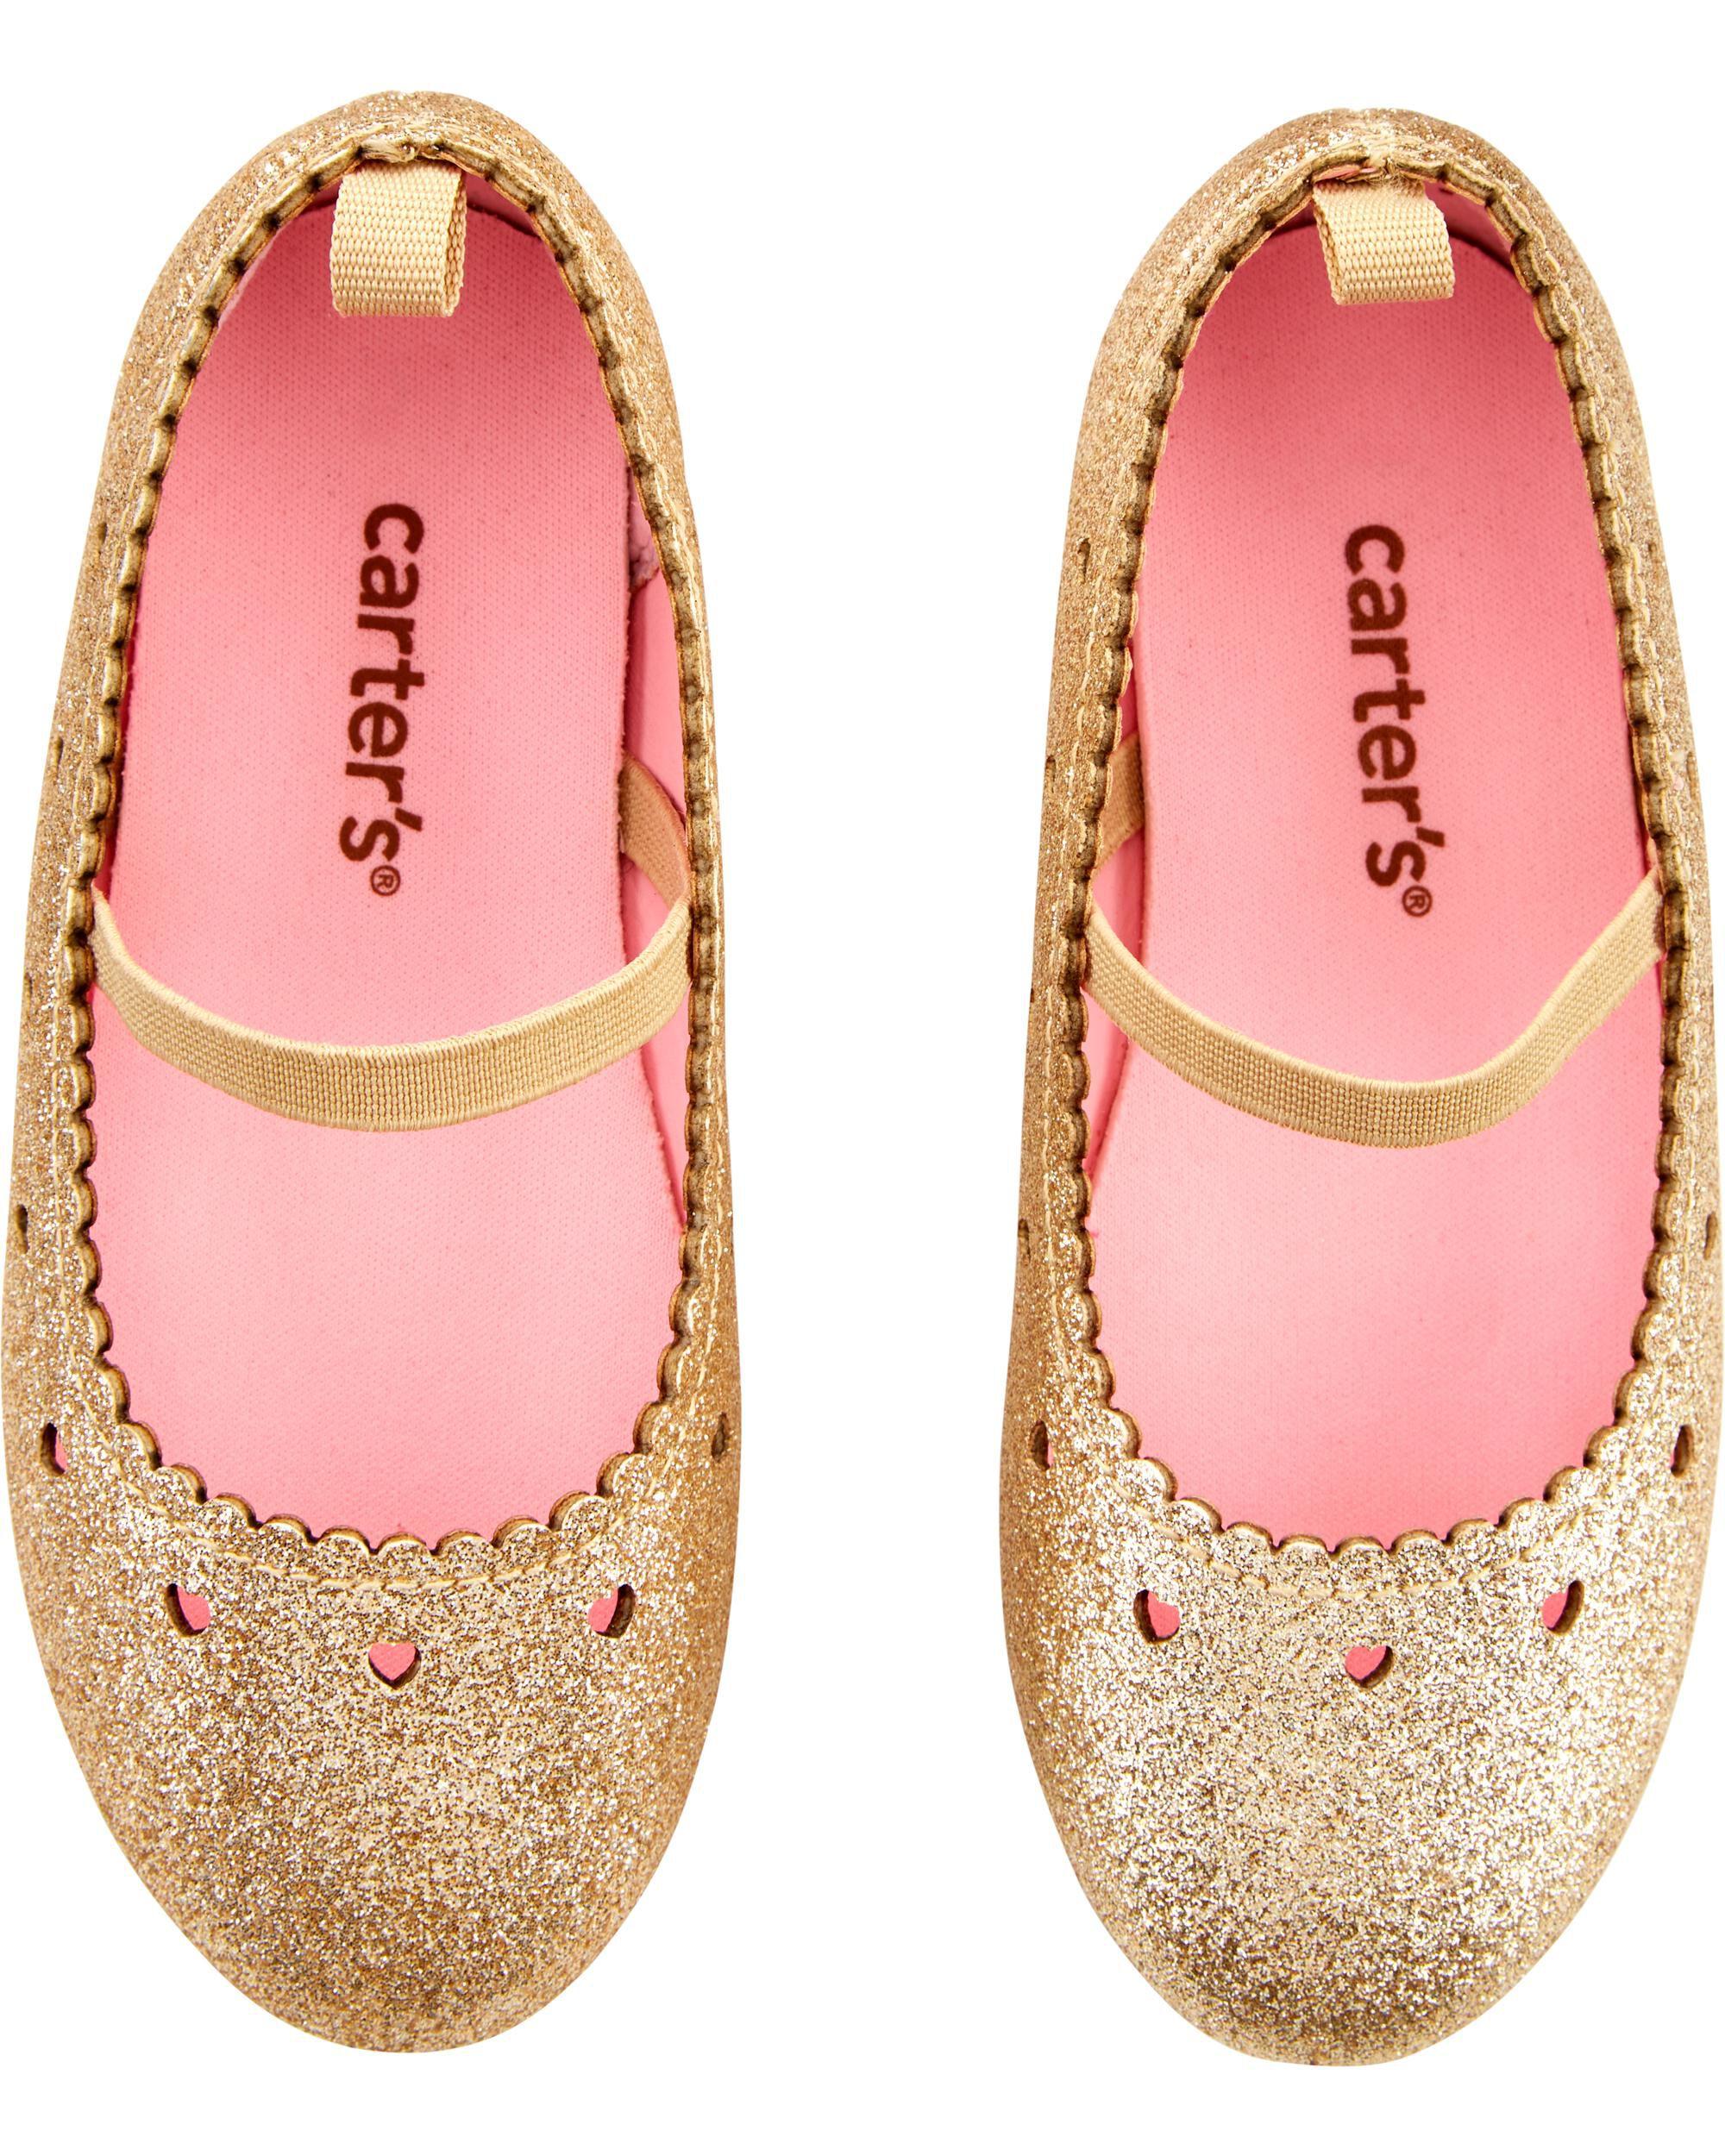 Girl Shoes | Carter's | Free Shipping